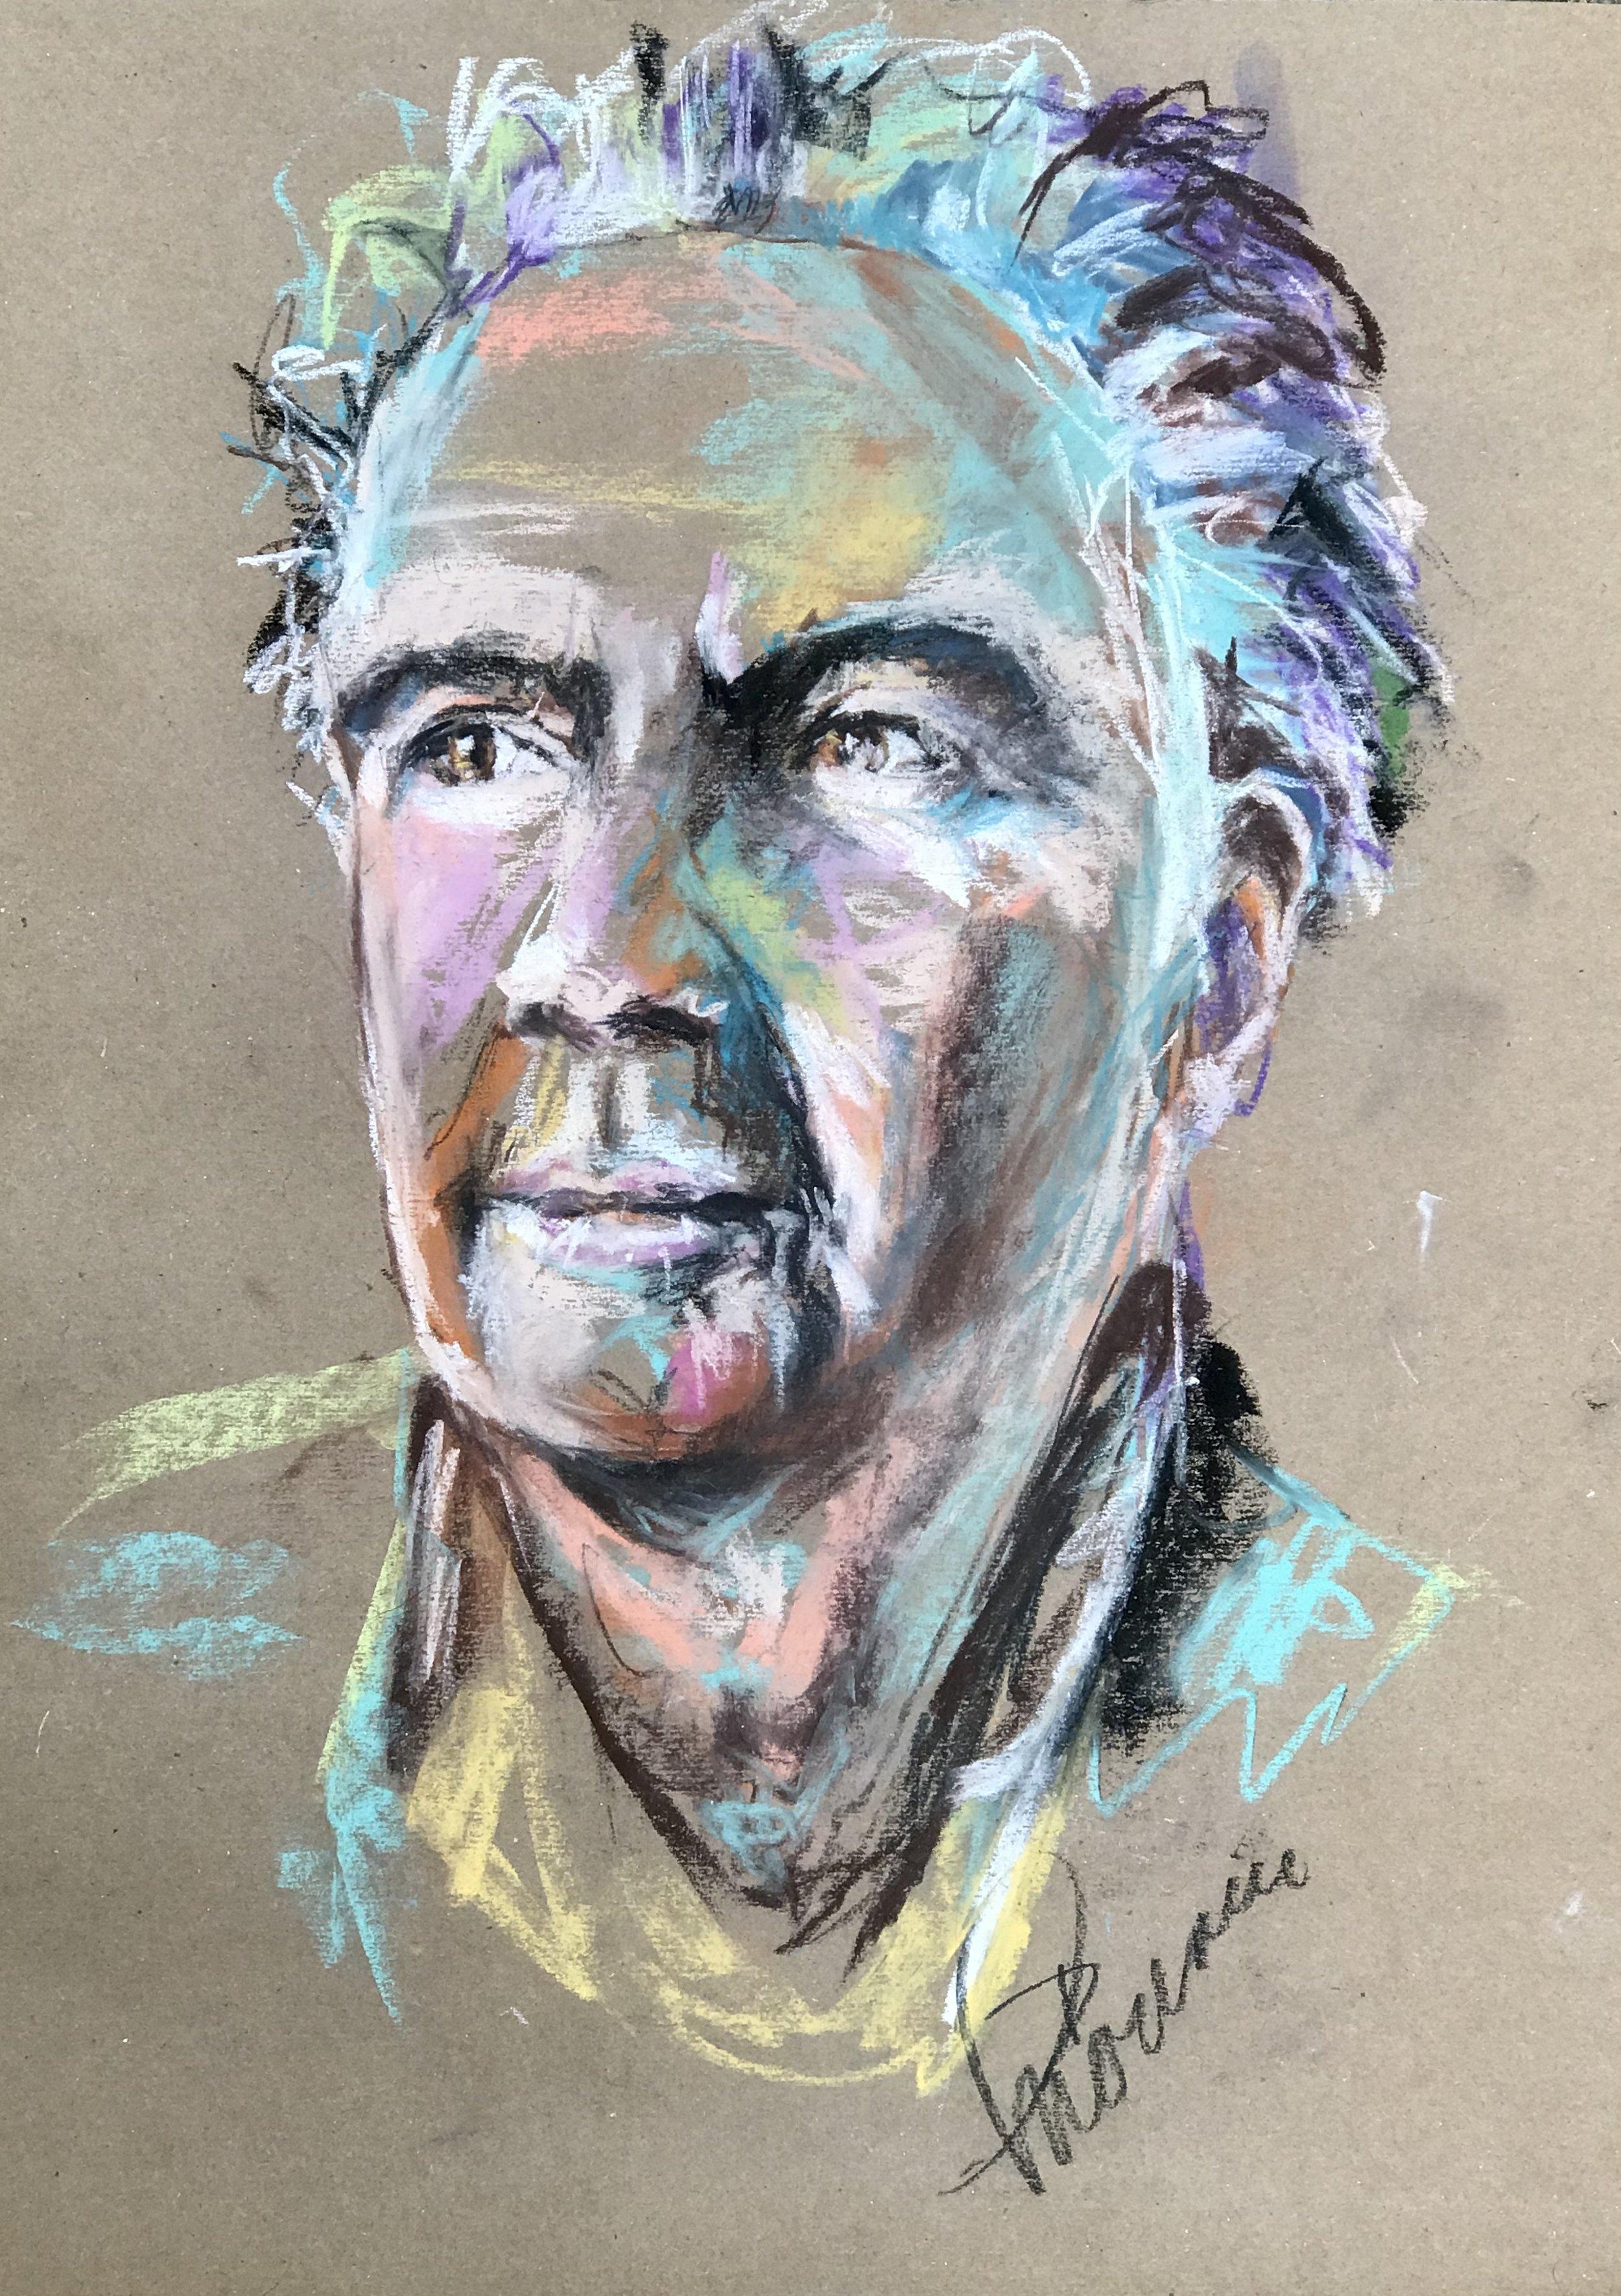 Anthony Bourdain sketch2018.jpg